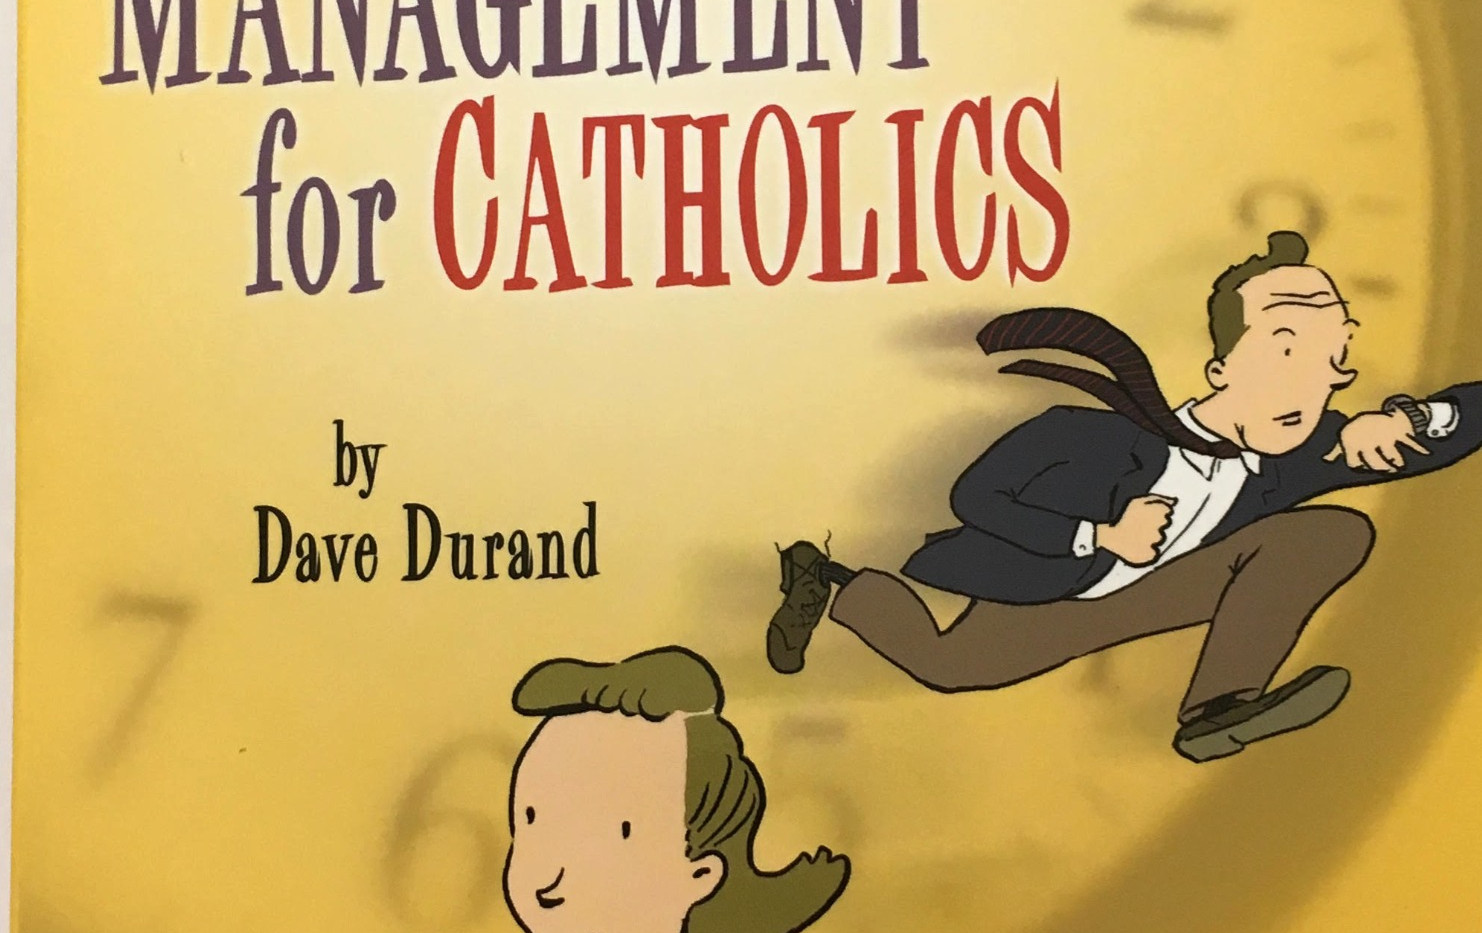 Time Management for Catholics